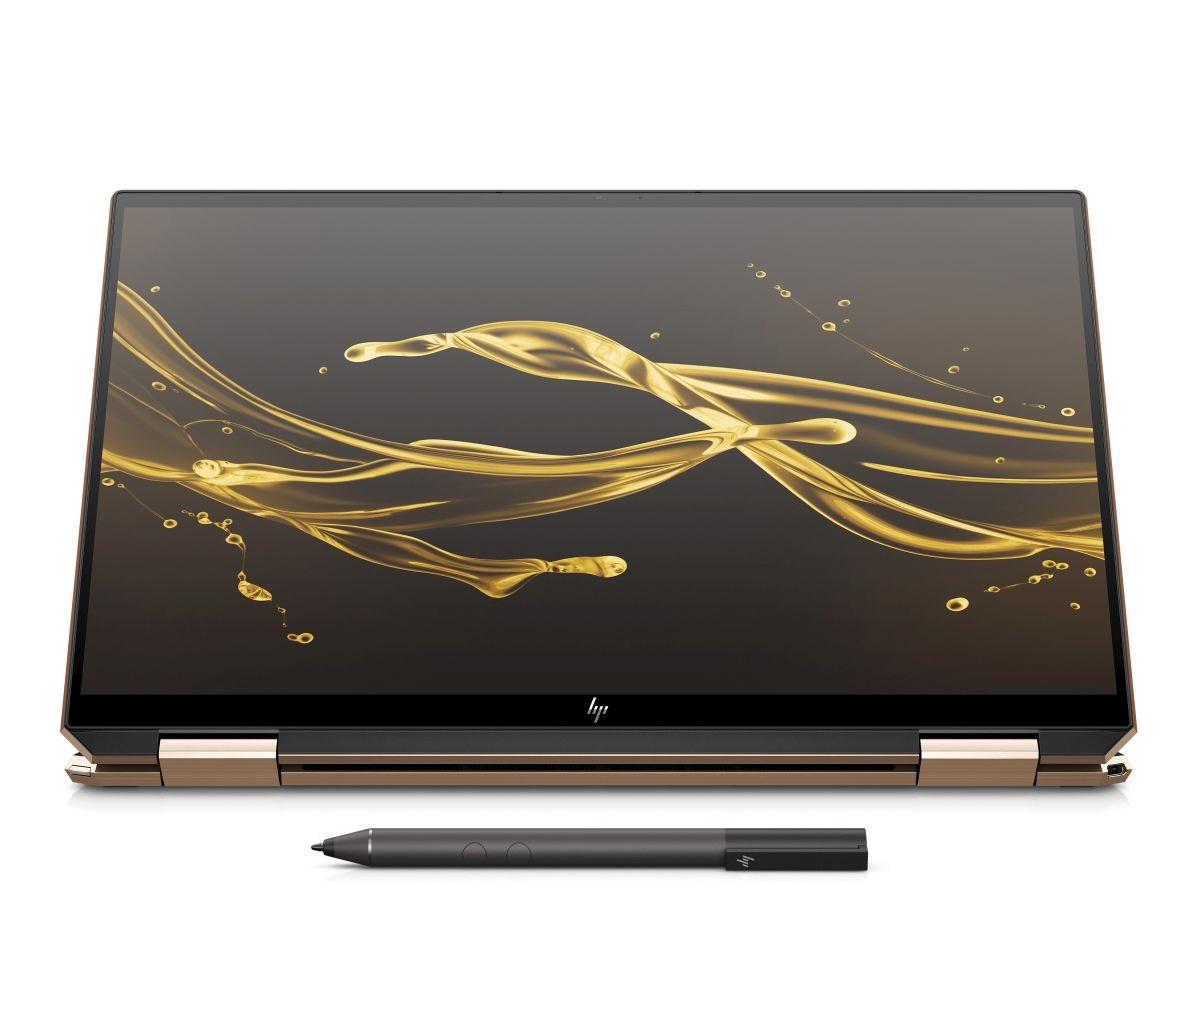 HP Spectre x360 Conv 13-aw0100nc